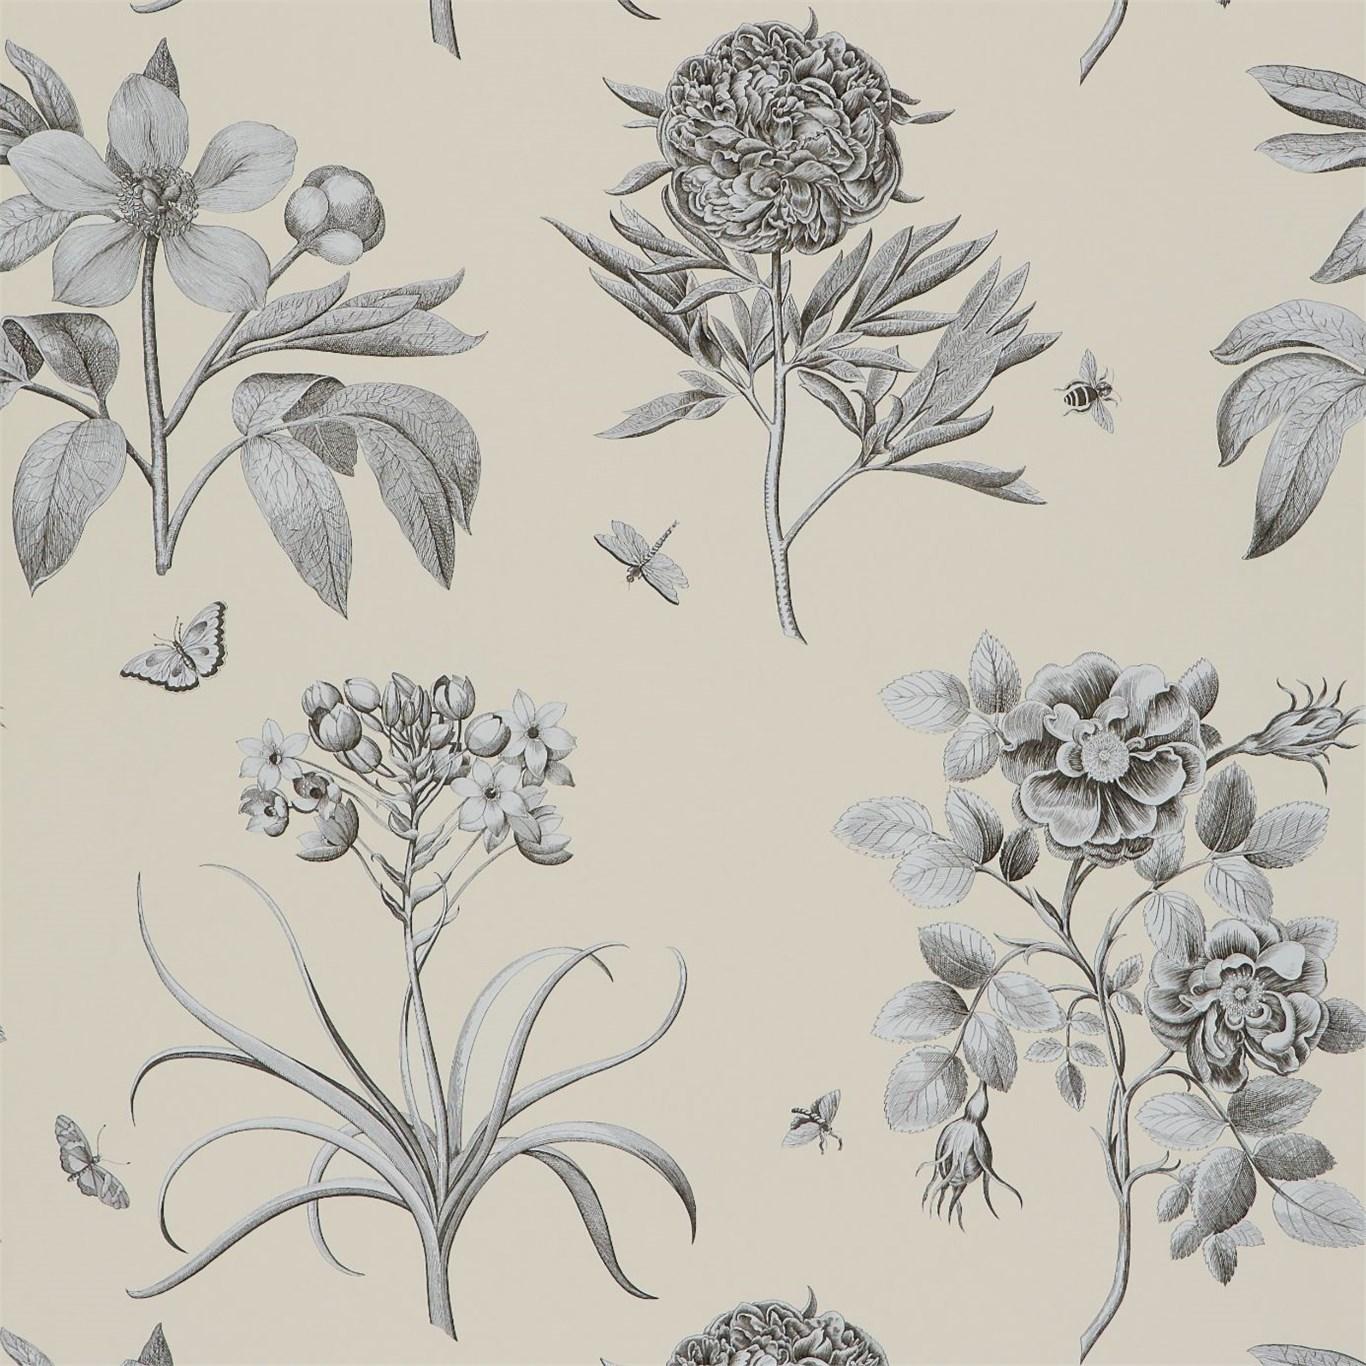 Обои Sanderson Parchment Flowers DPFWER106, интернет магазин Волео